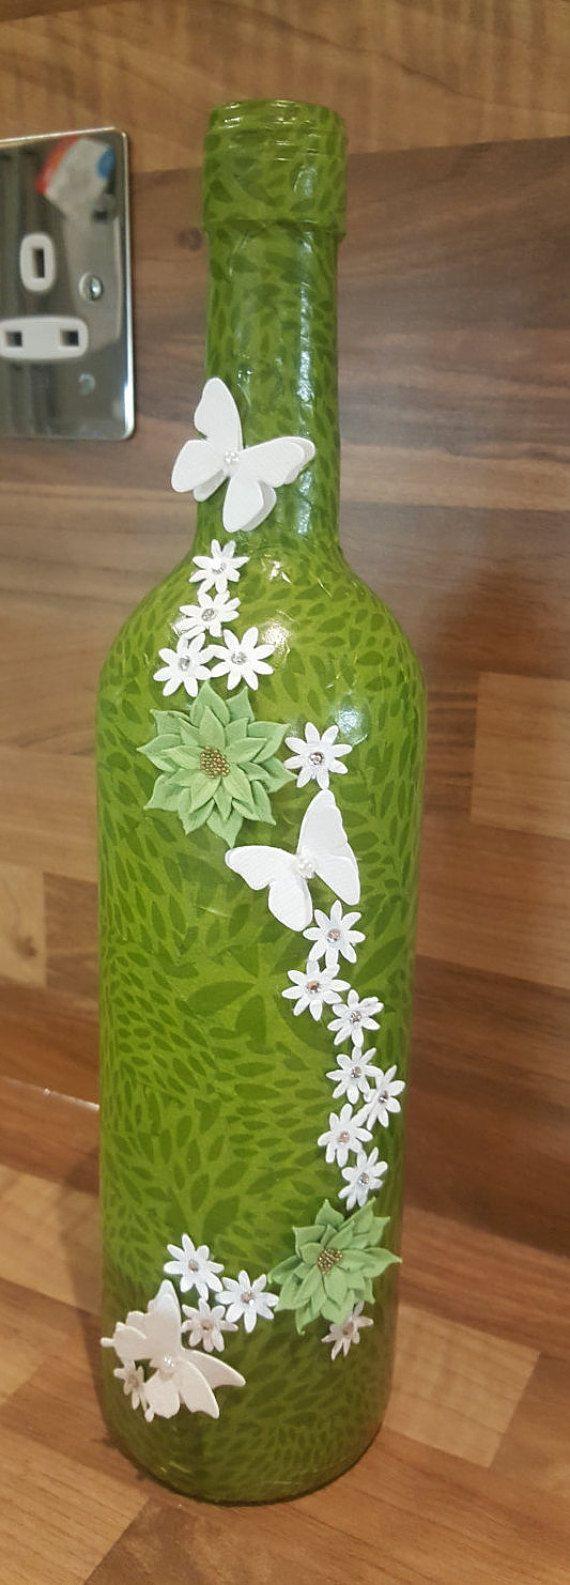 Decorative Wine Bottle by TheMintDeco on Etsy